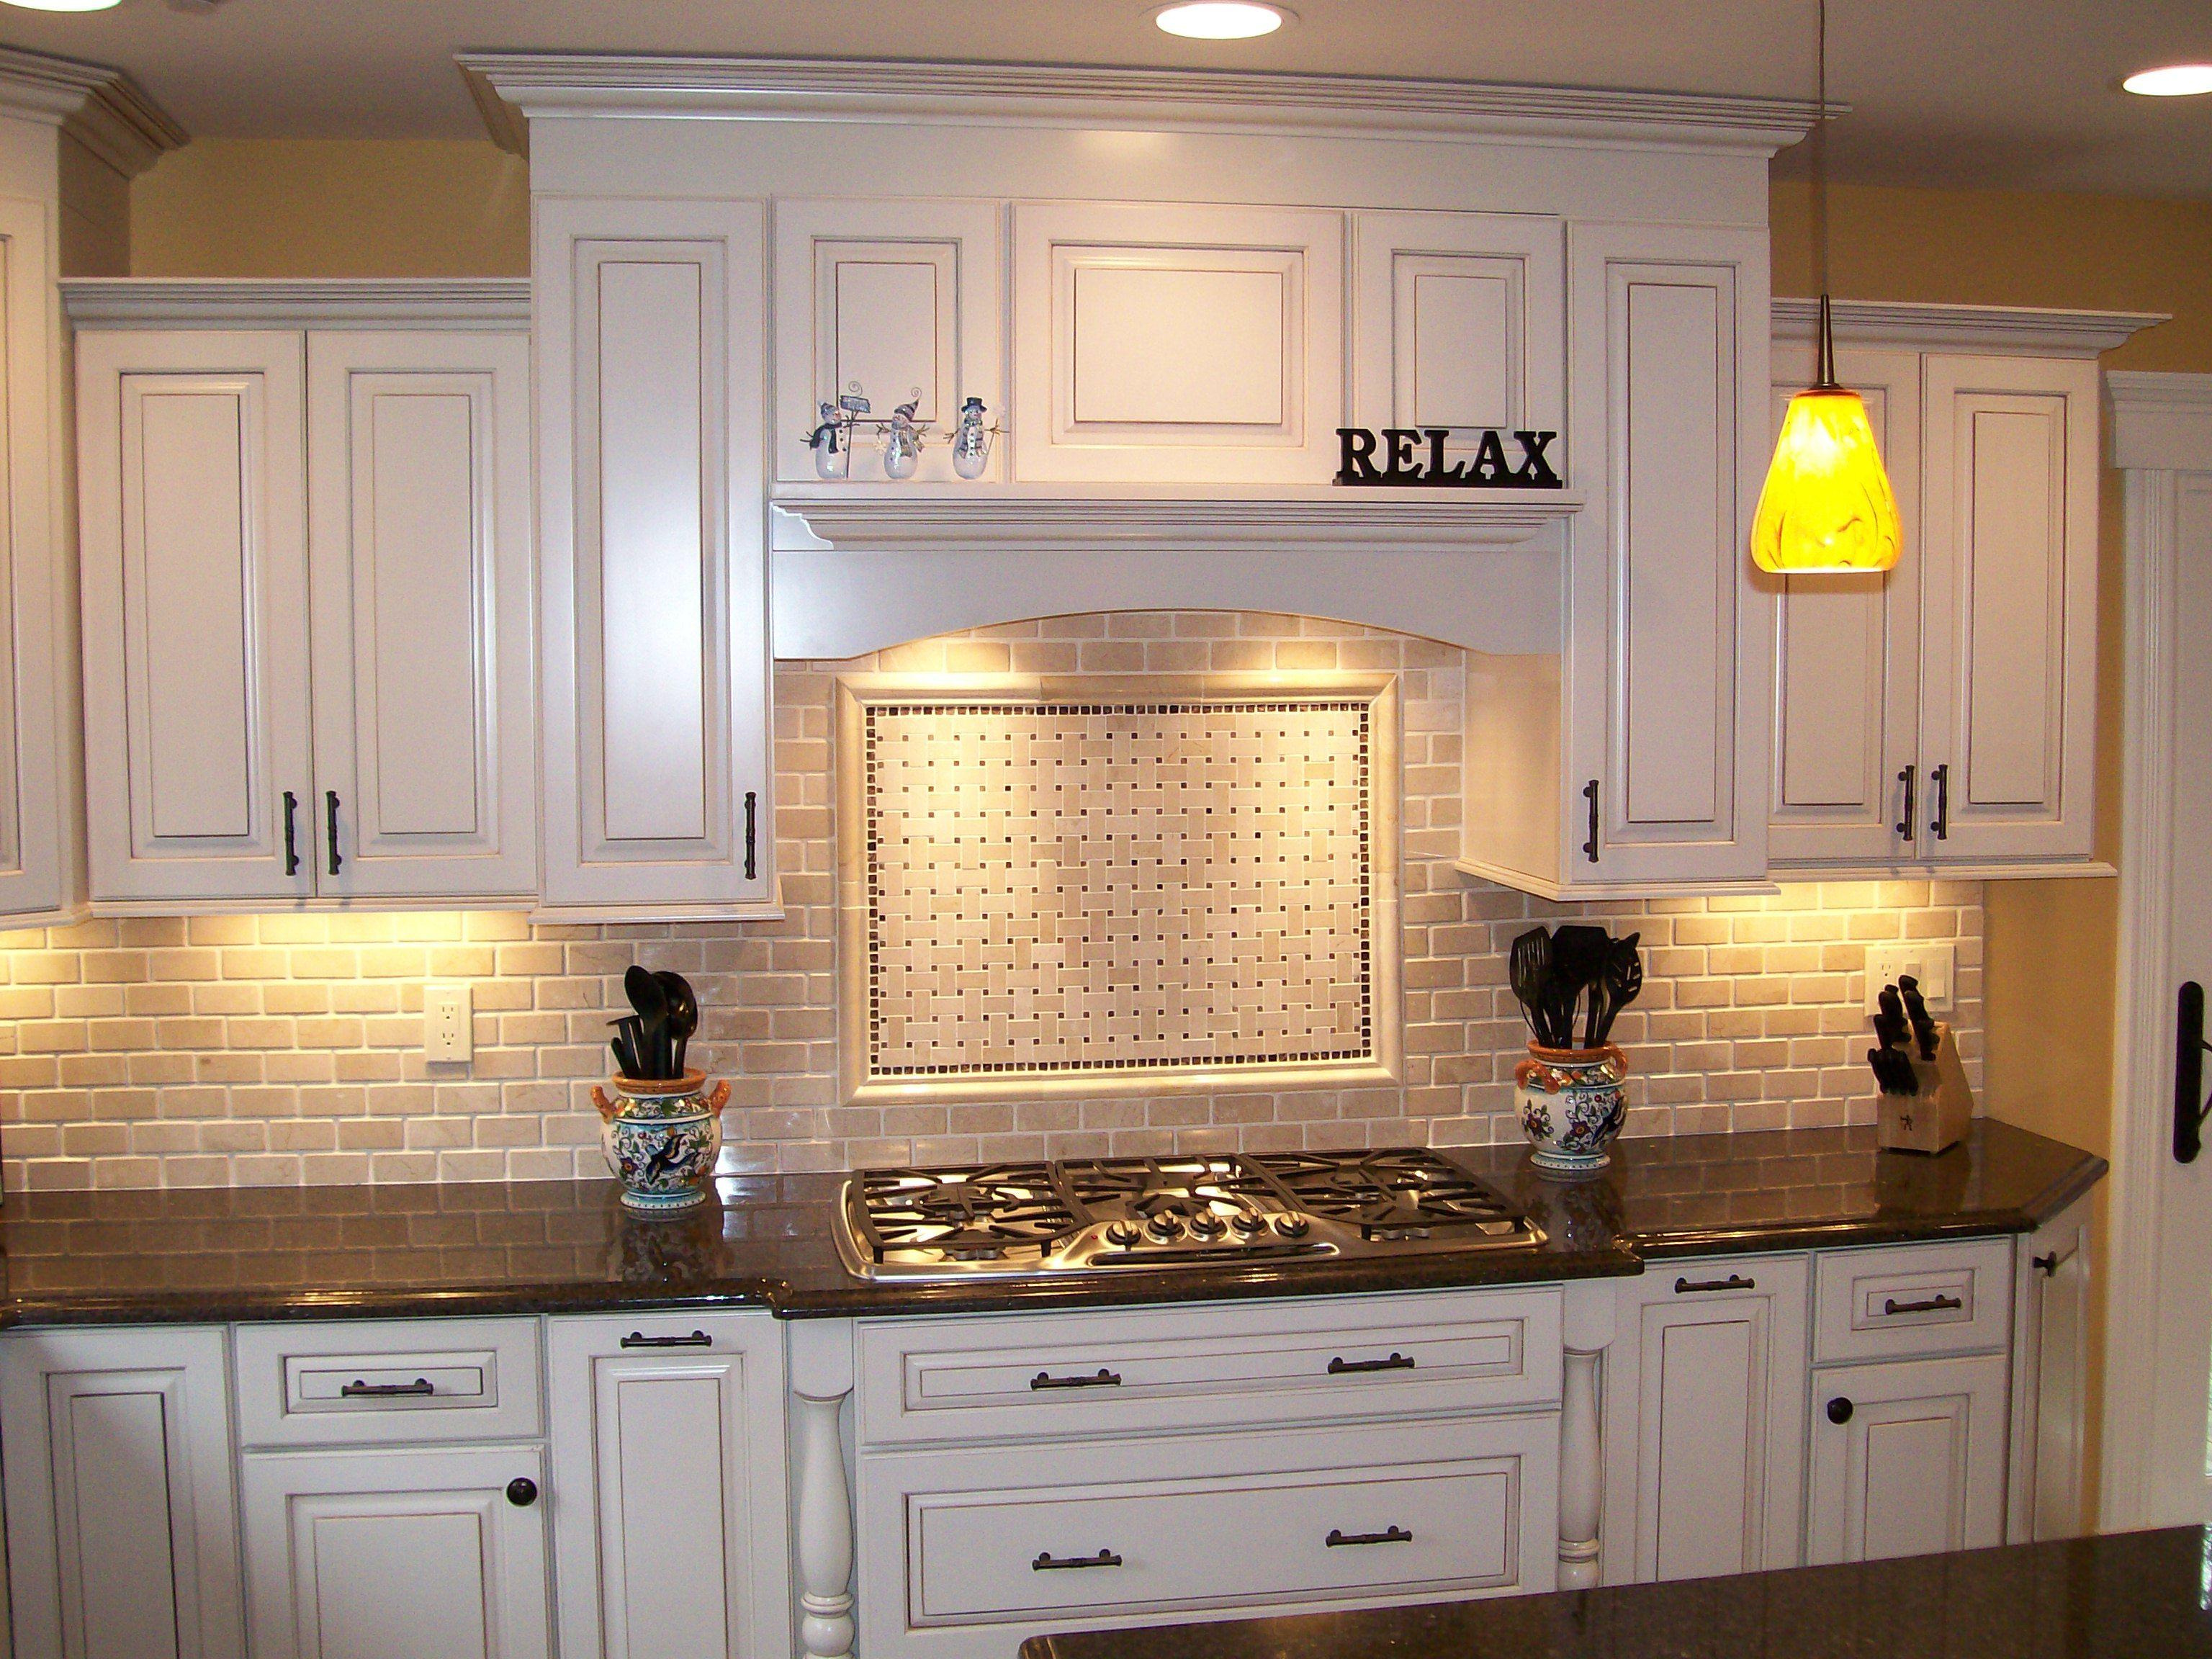 Kitchen Nice Brick Backsplash In Kitchen With White Cabinet And